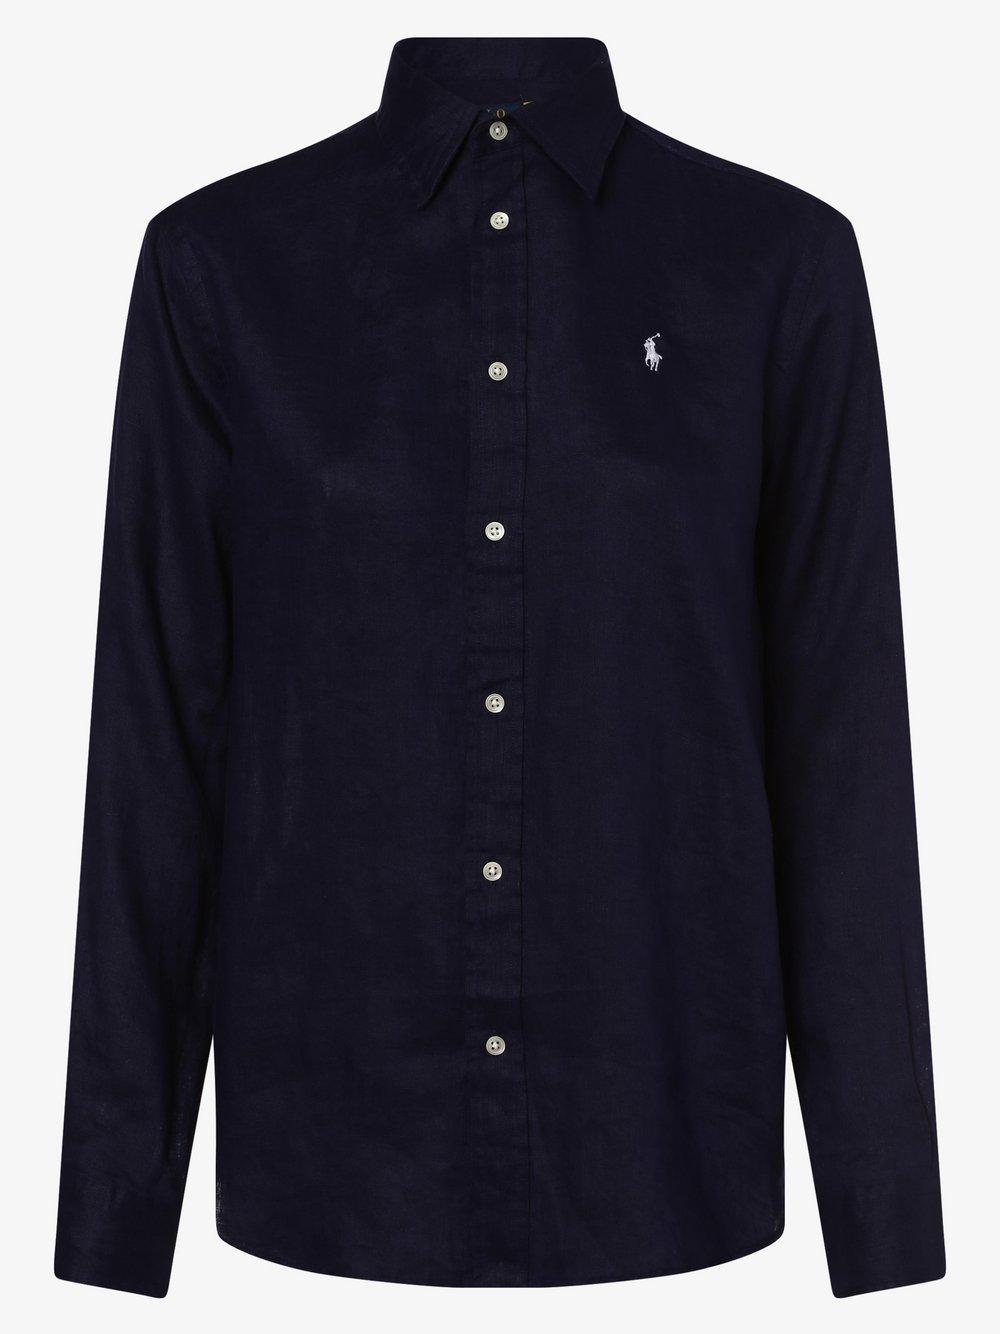 Polo Ralph Lauren - Damska bluzka lniana – Relaxed Fit, niebieski